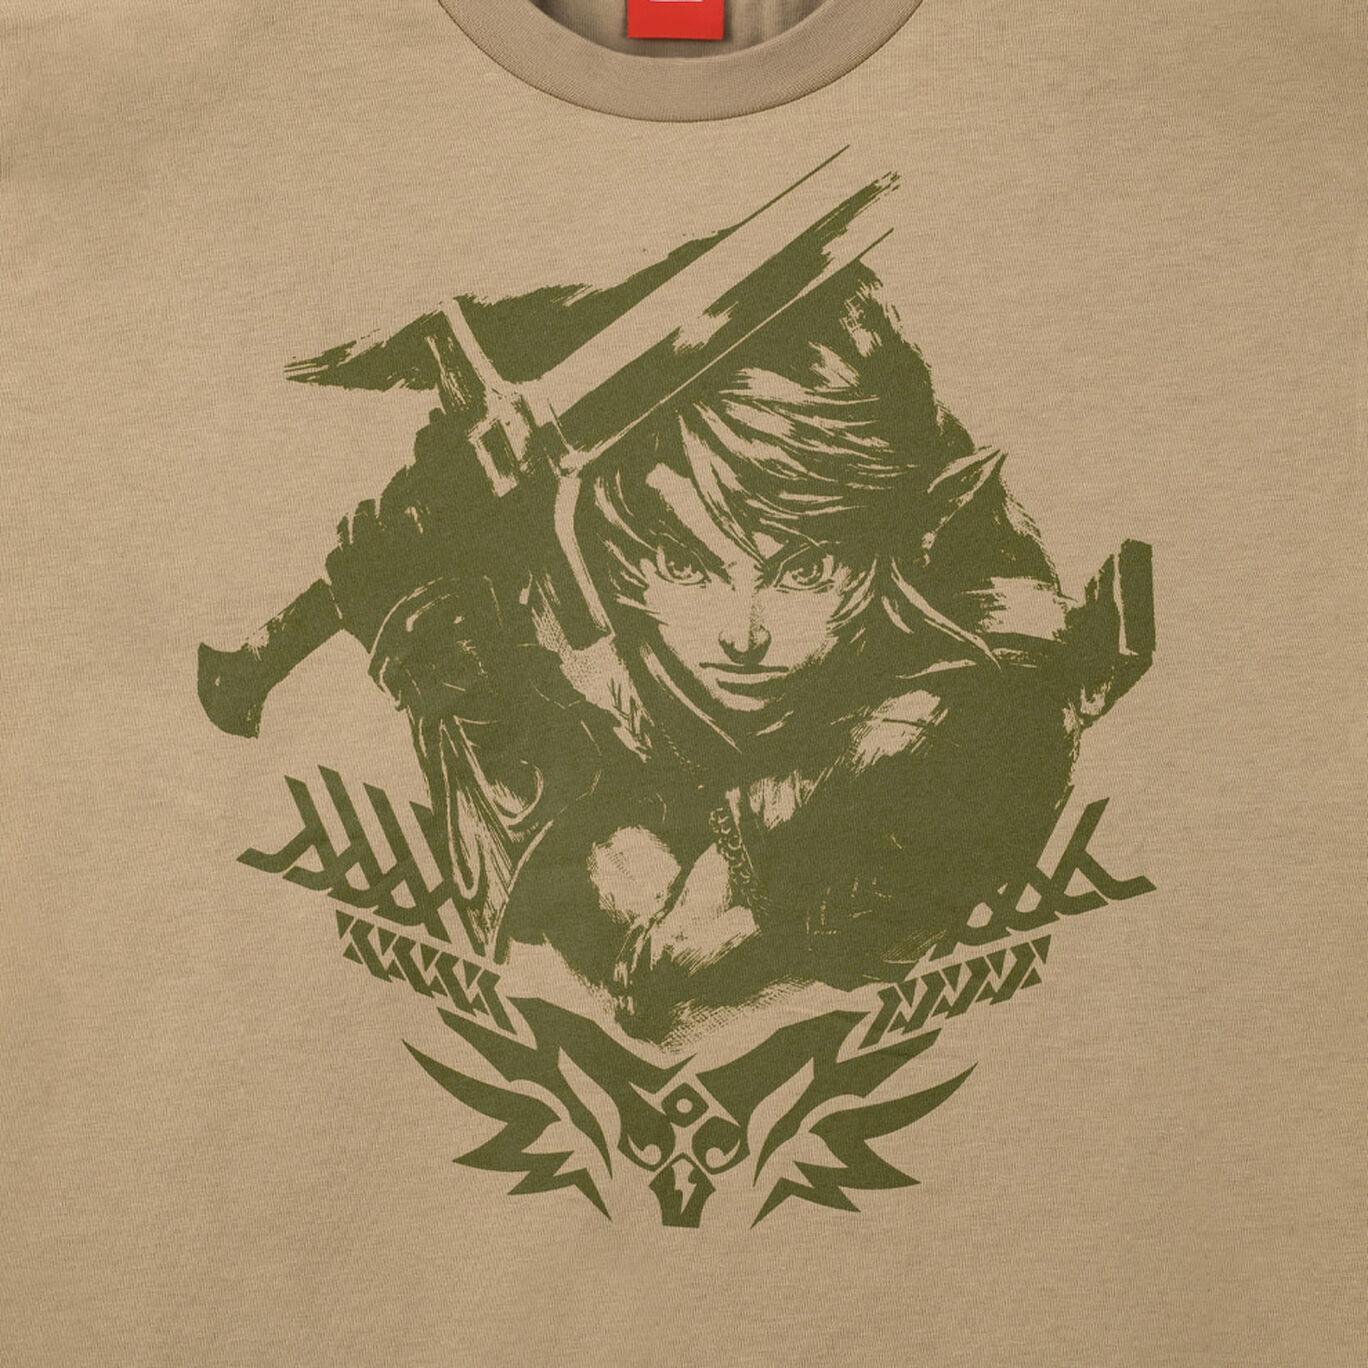 Tシャツ トライフォース リンク S ゼルダの伝説【Nintendo TOKYO取り扱い商品】